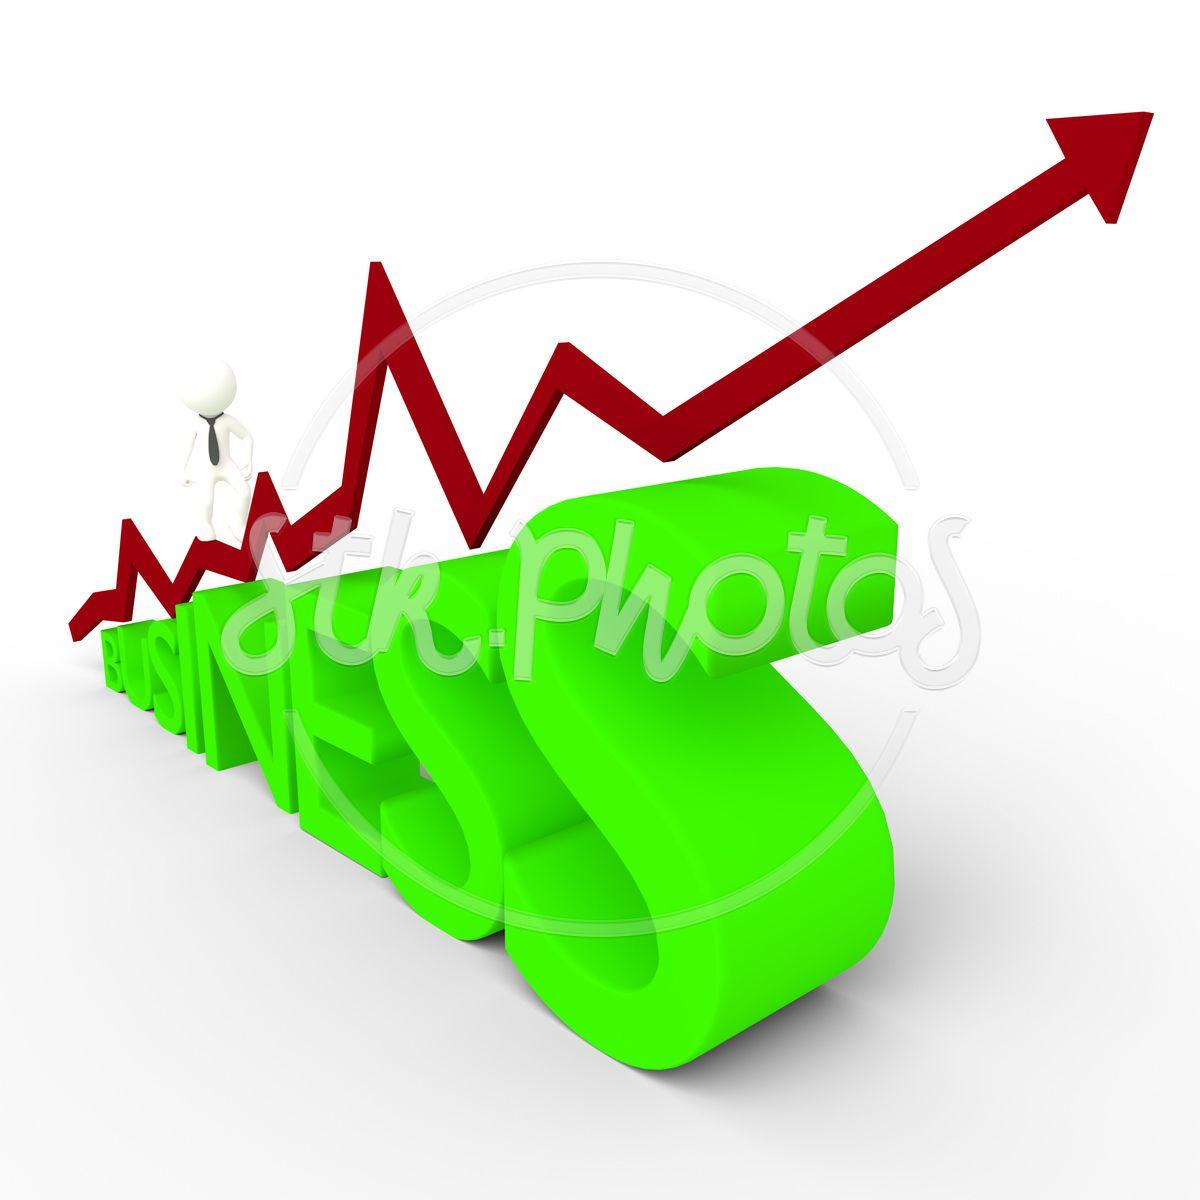 FREE STOCK PHOTOS Free and affordable premium stock photos